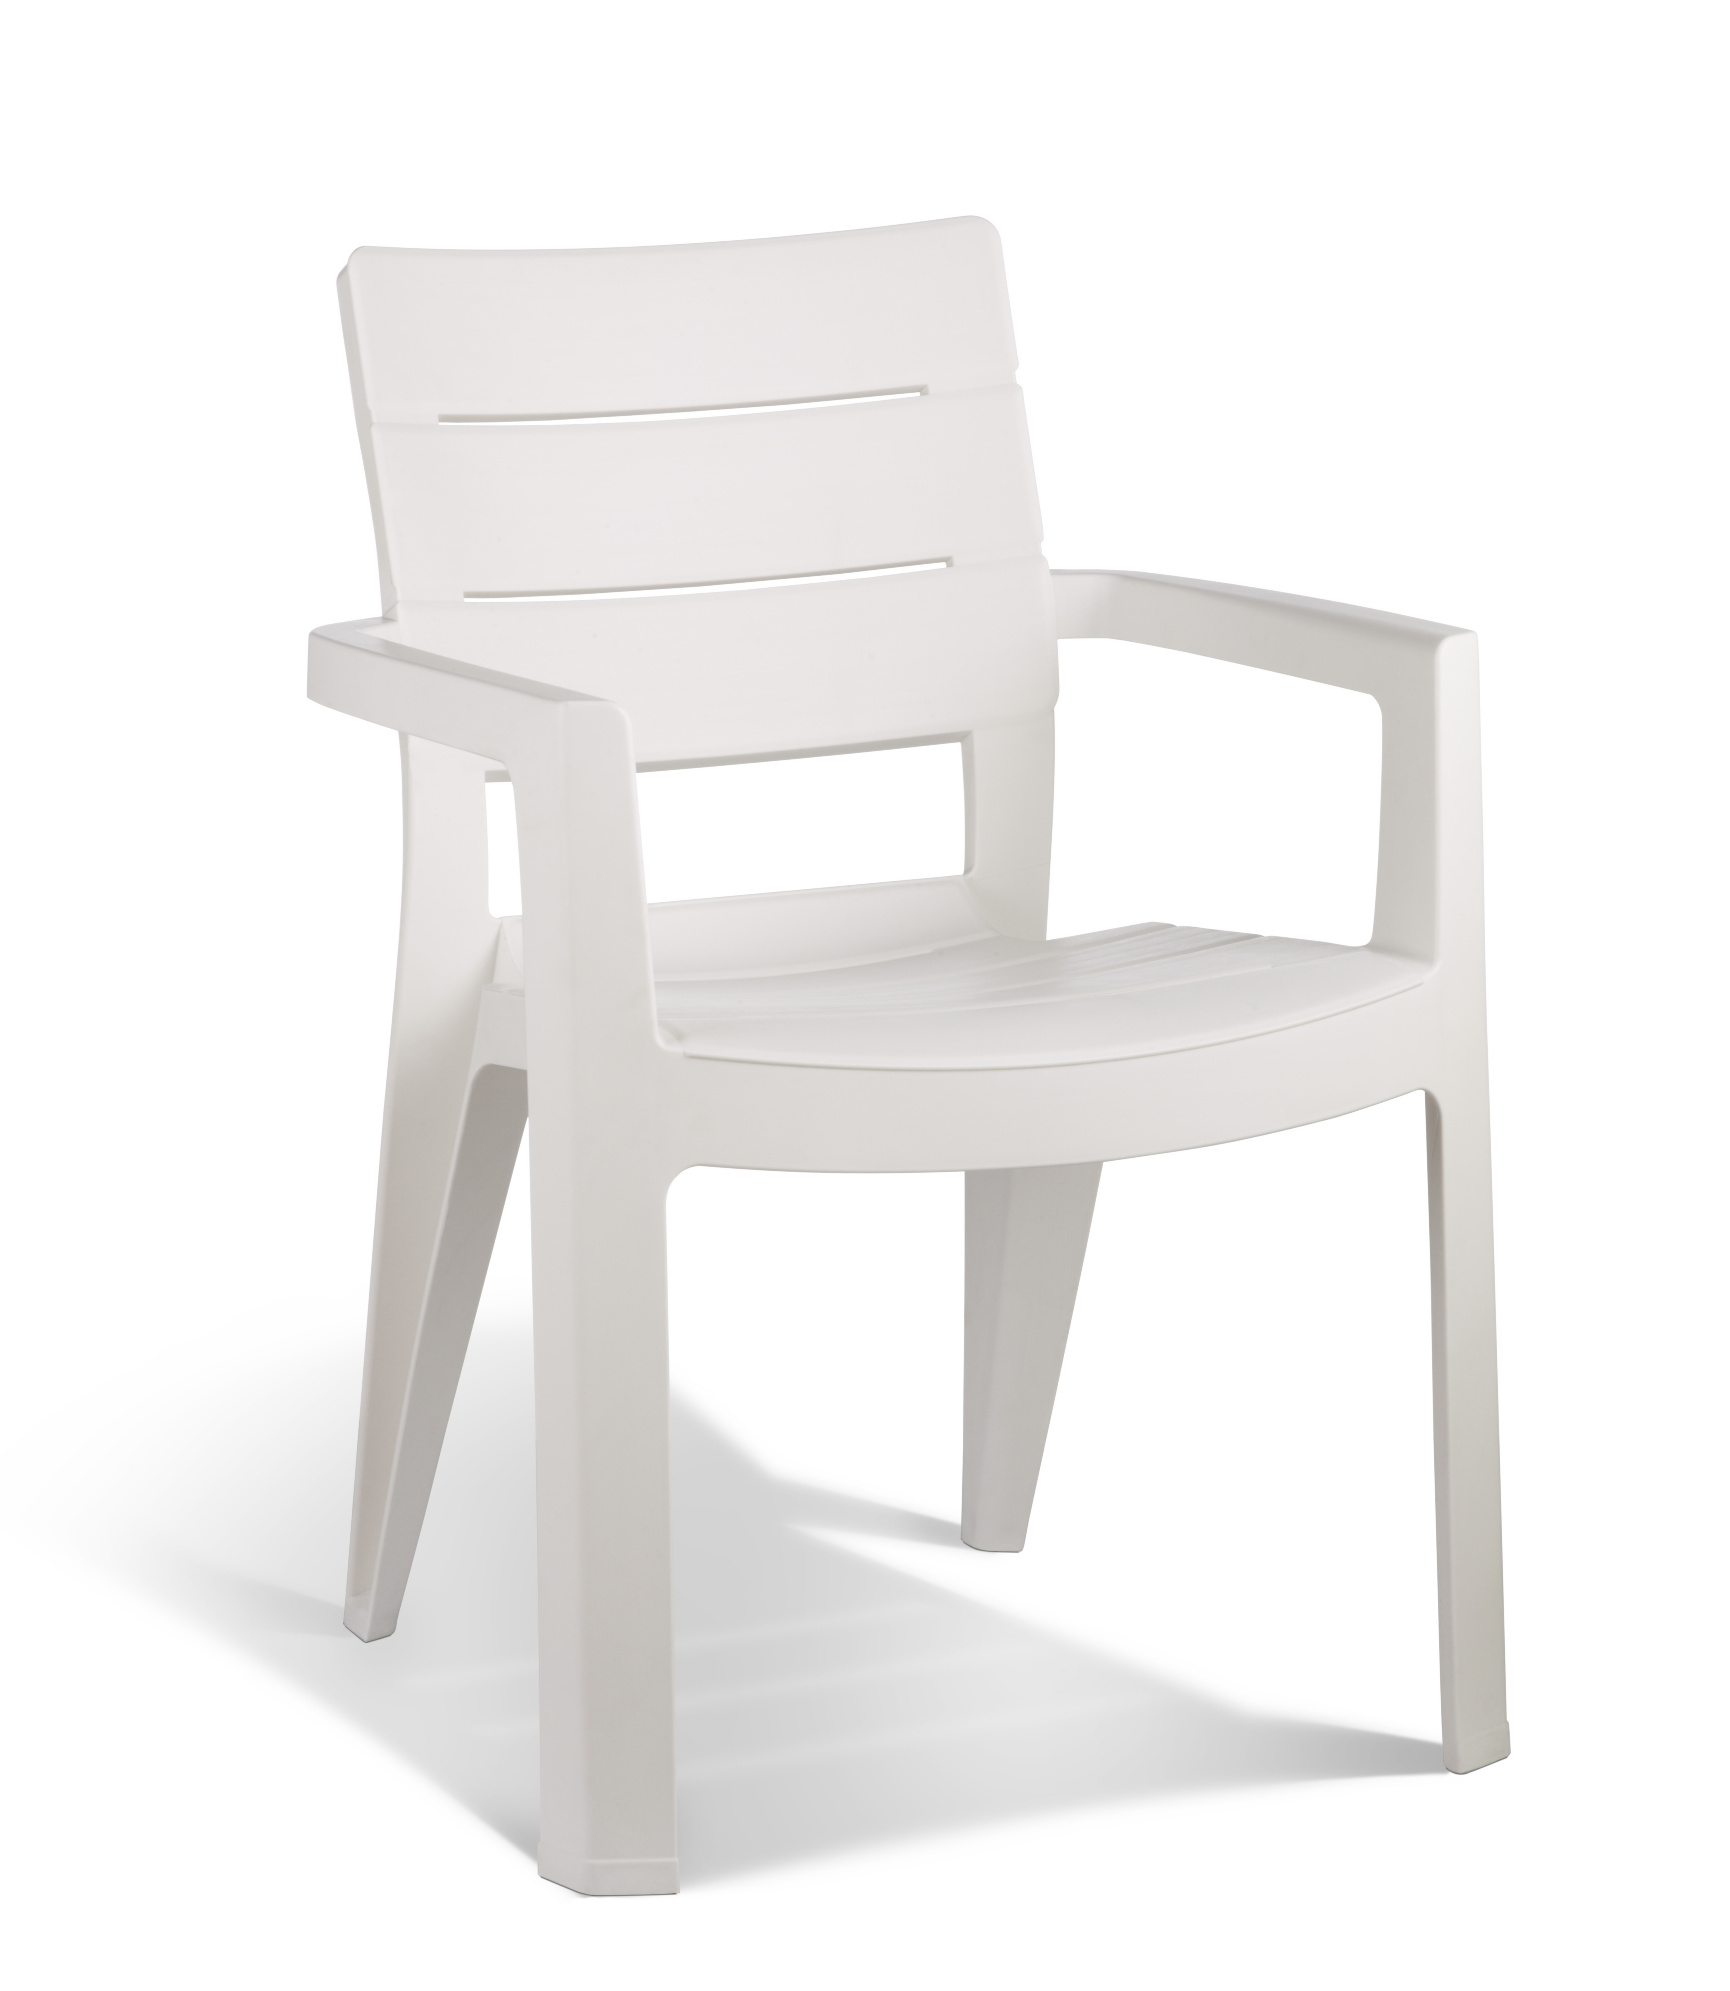 allibert ibiza garden chair white allibert. Black Bedroom Furniture Sets. Home Design Ideas